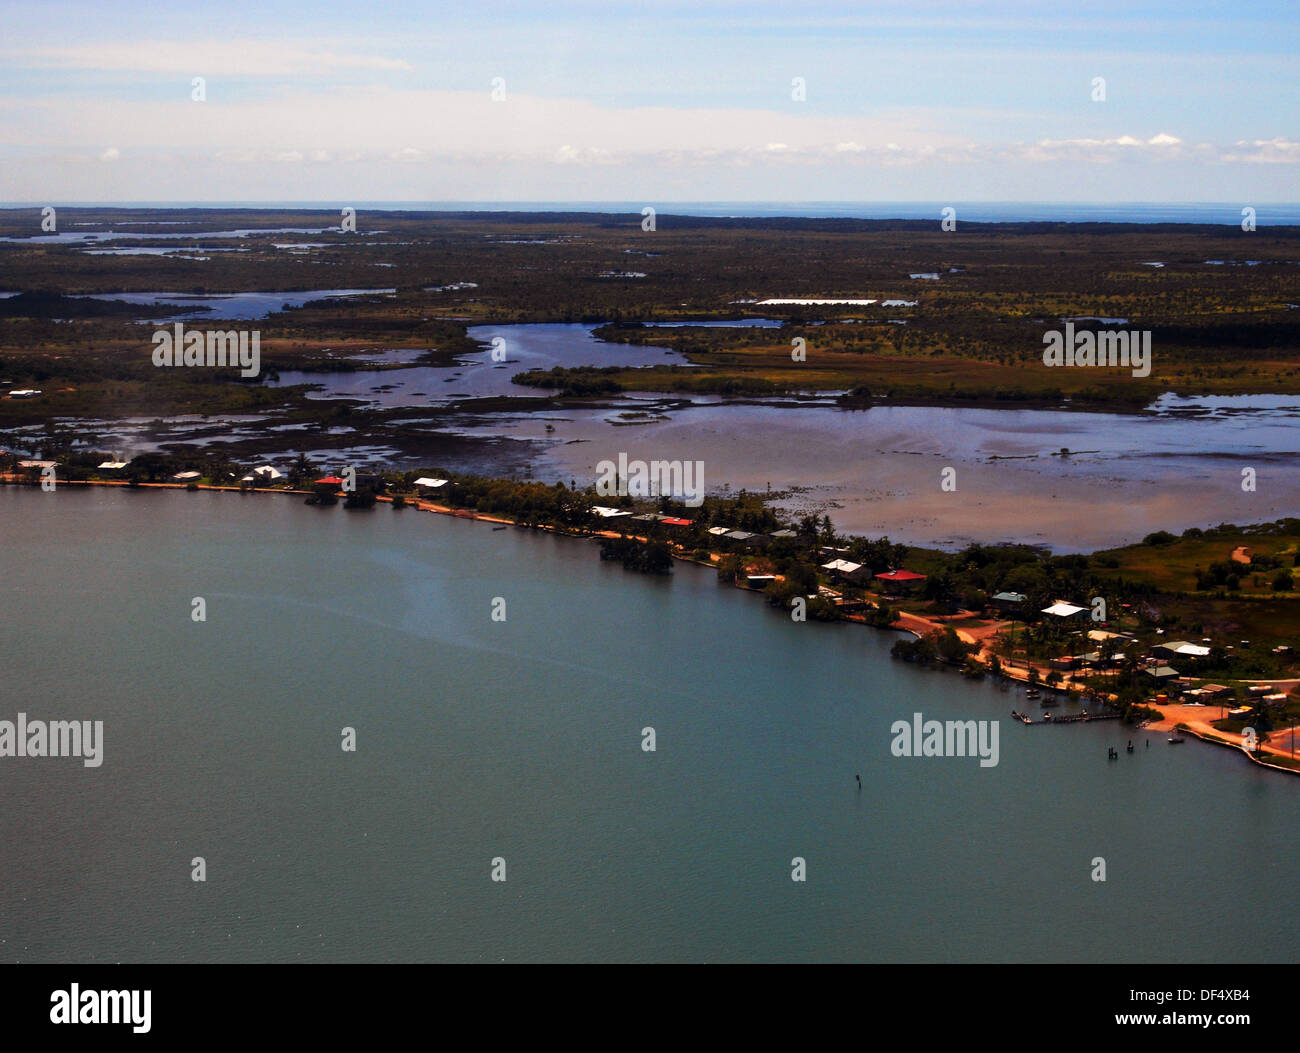 Saibai Island: Aerial View Of Saibai Island During King Tide Inundation